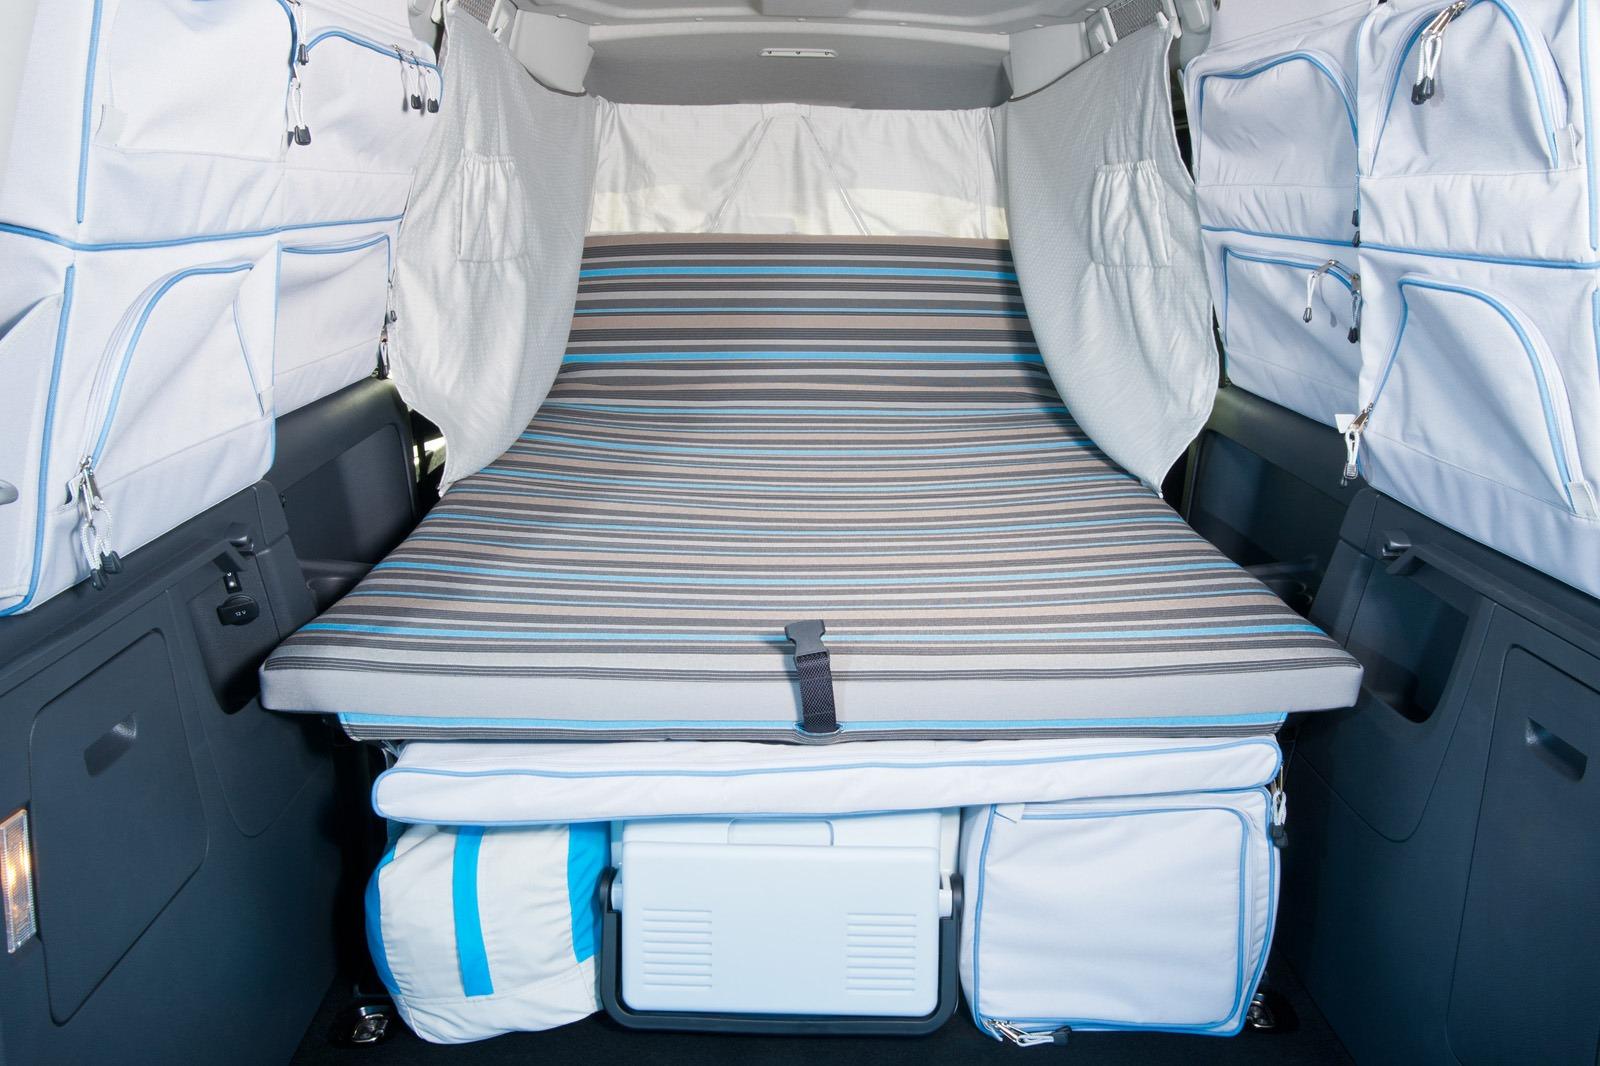 volkswagen caddy maxi camper is the camping van for the masses carscoop. Black Bedroom Furniture Sets. Home Design Ideas